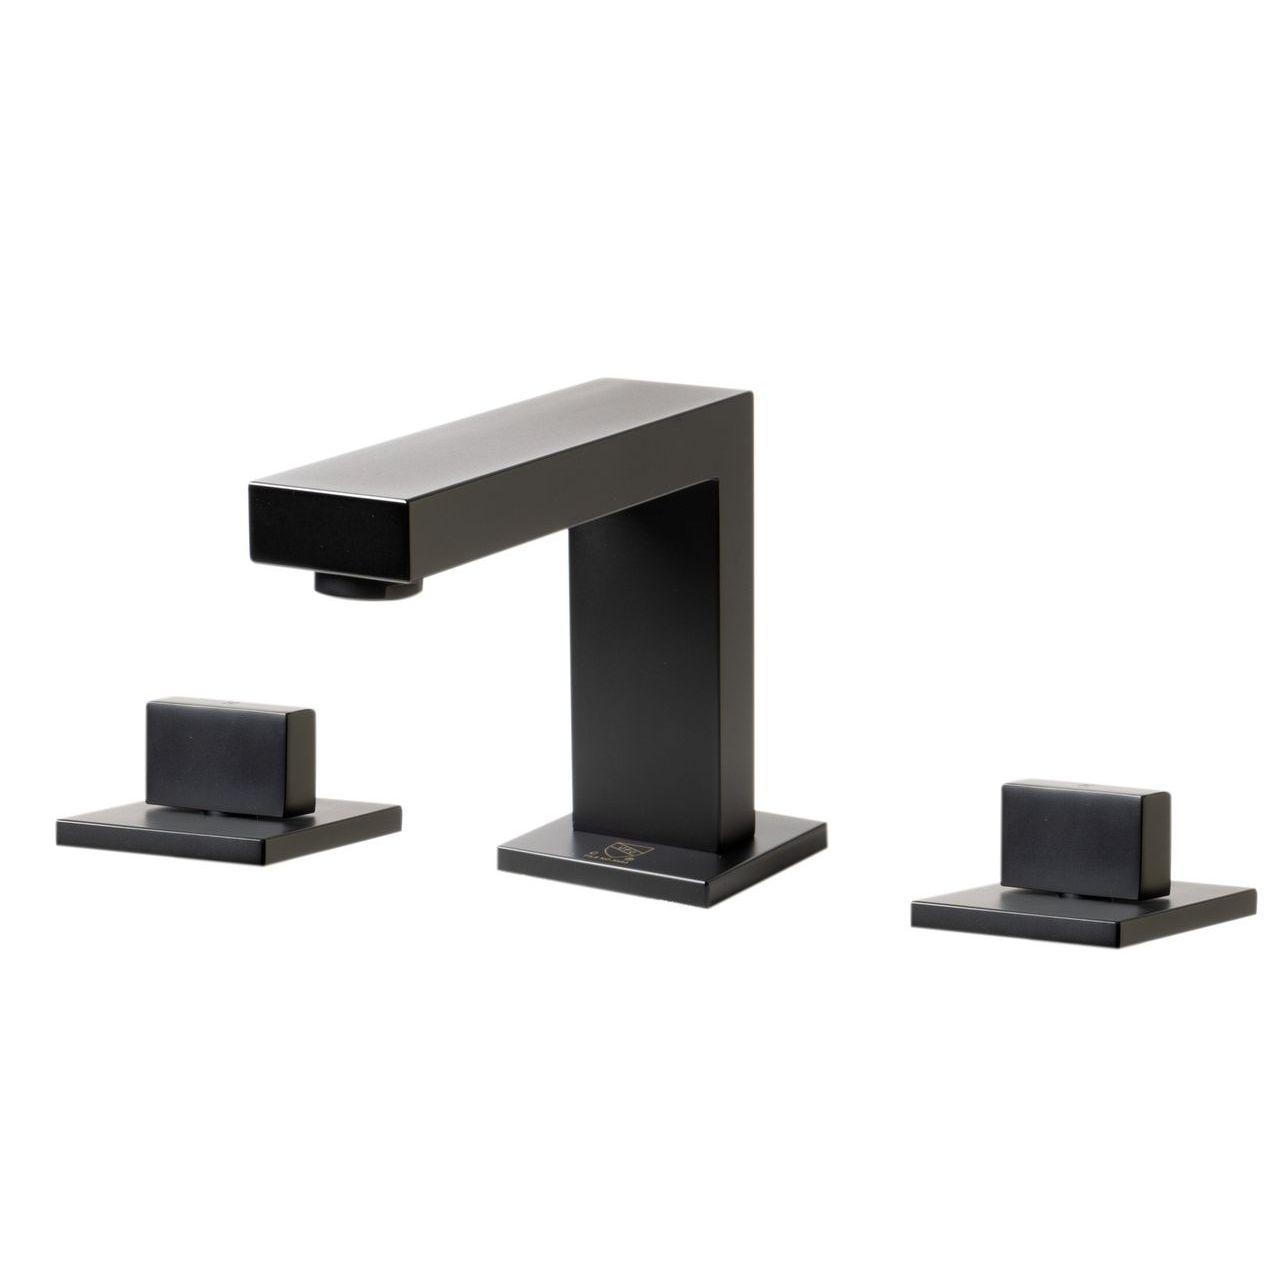 ALFI AB1322-BM Black Matte Widespread Modern Bathroom Faucet